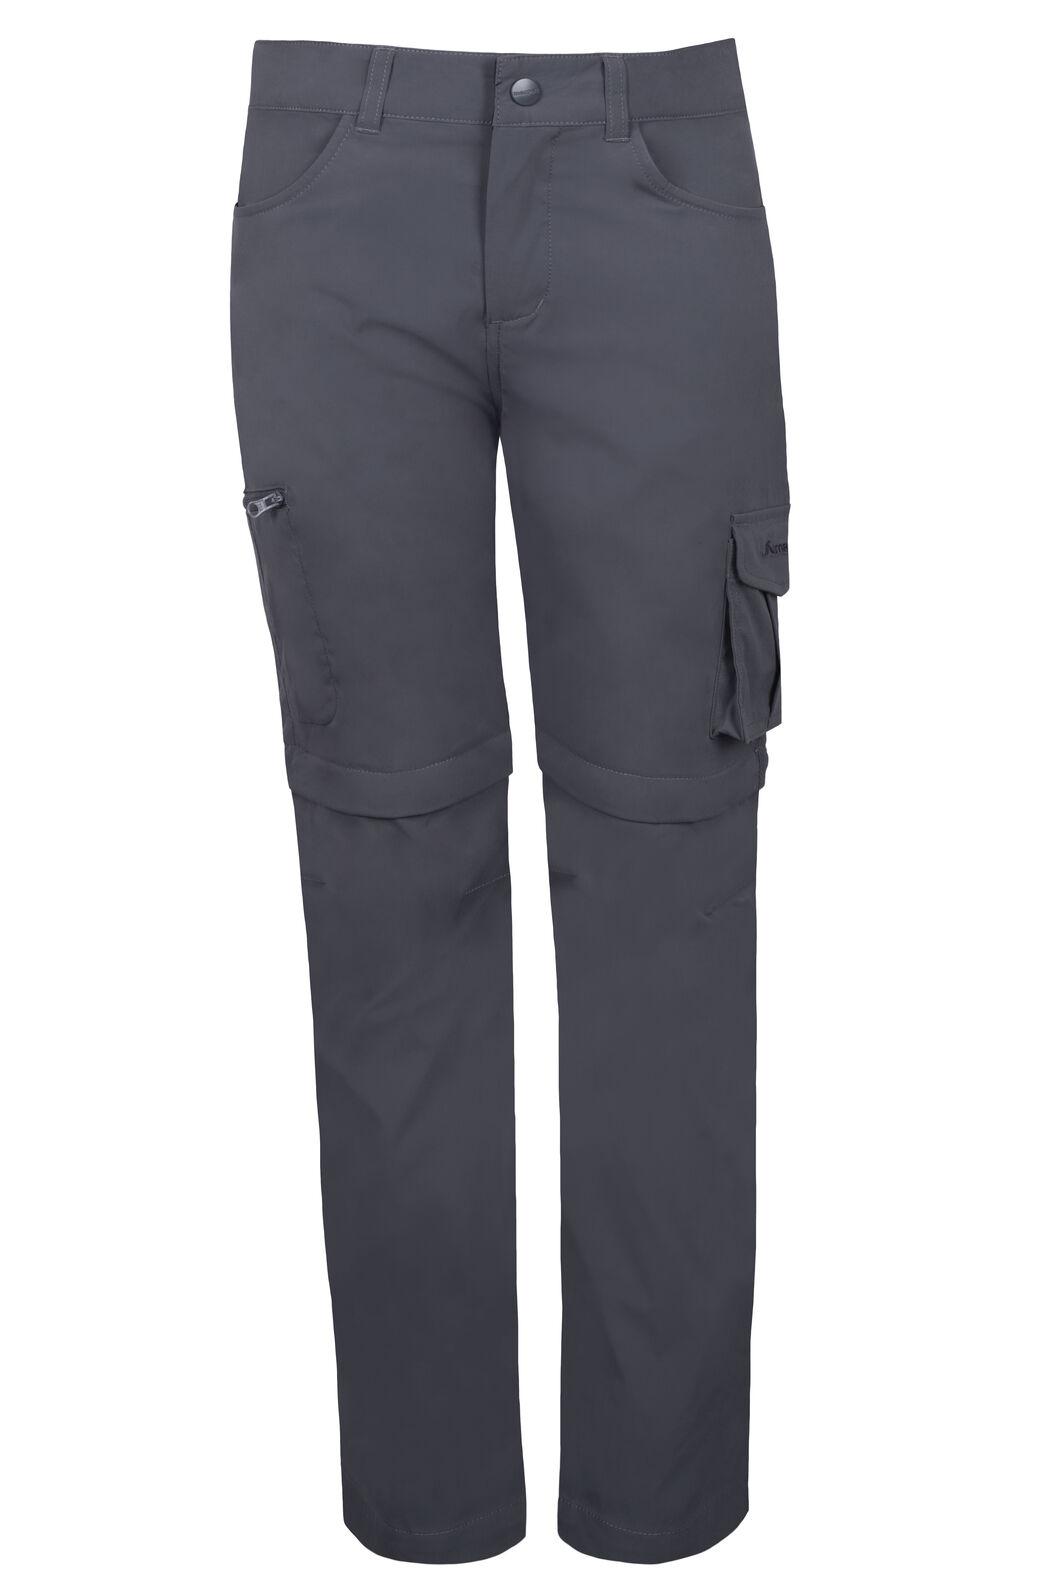 Macpac Rockover Convertible Pants - Kids', Forged Iron, hi-res